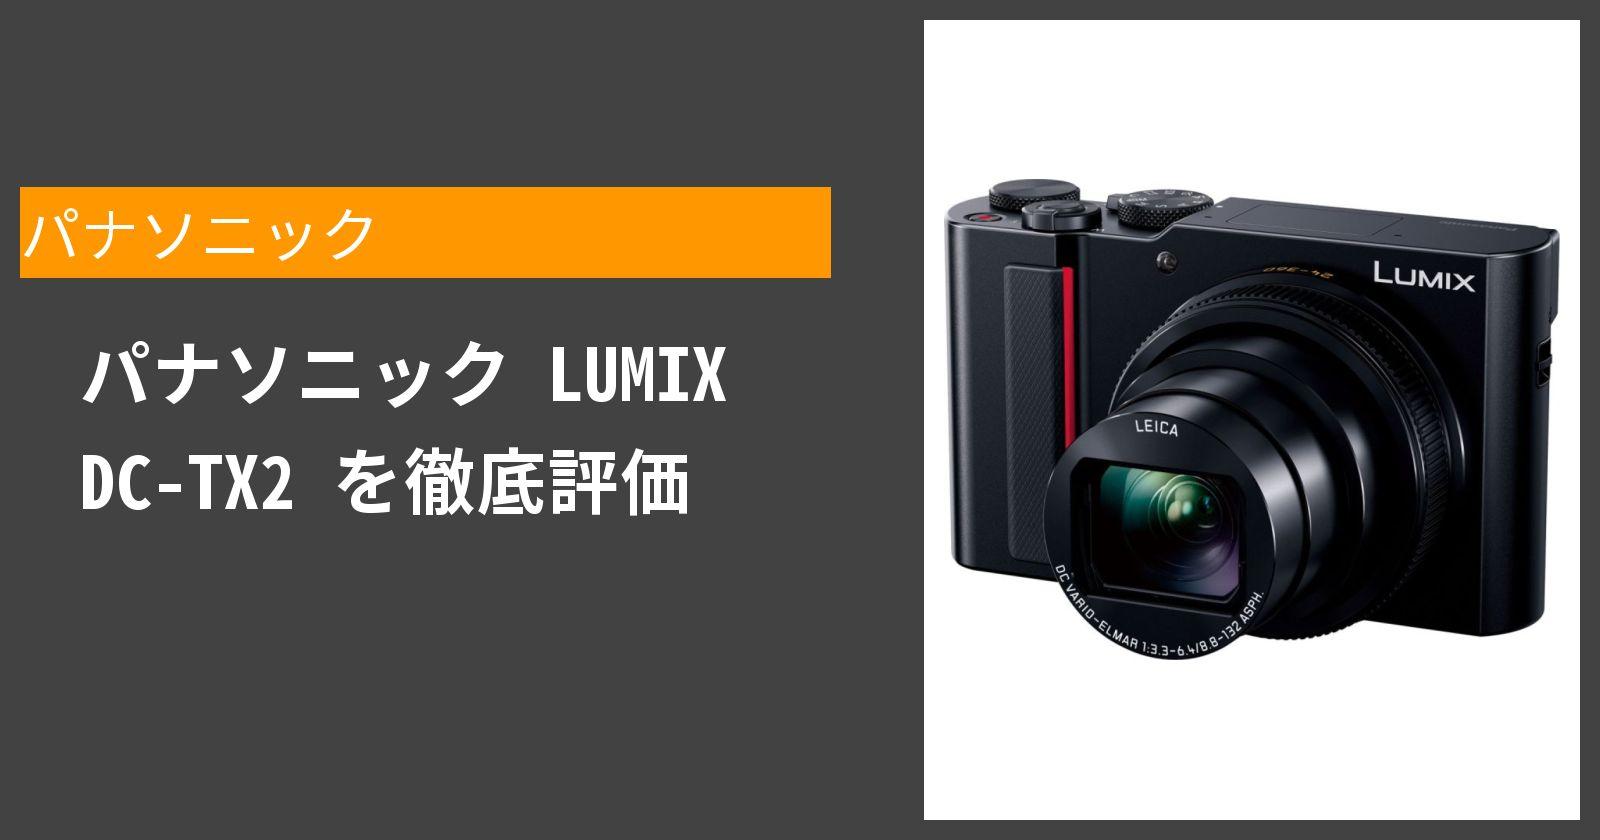 LUMIX DC-TX2を徹底評価